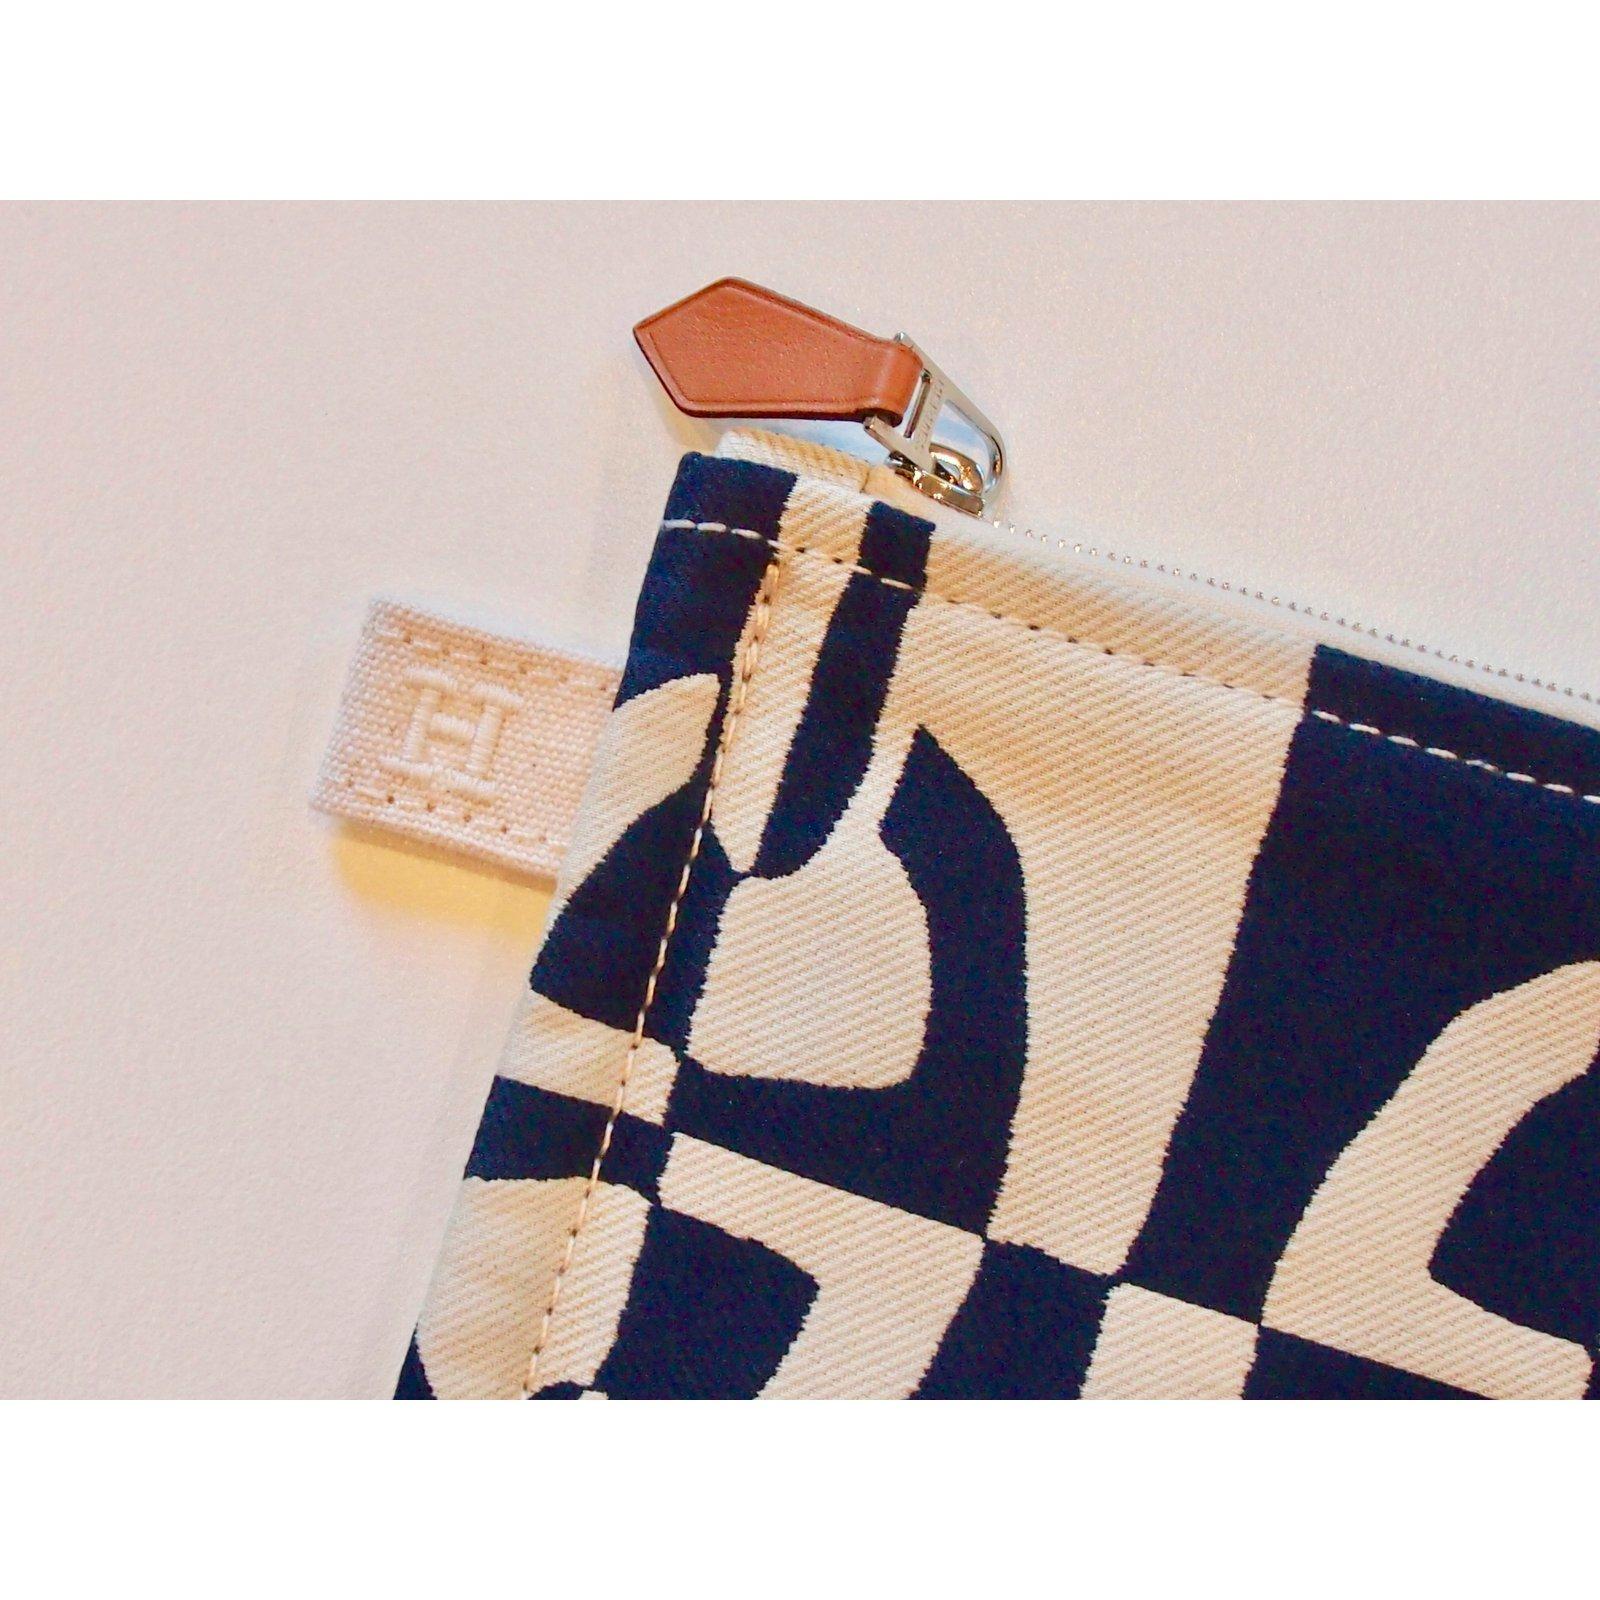 d2c4124bb840 Facebook · Pin This. Hermès Large model Atlantic pouch Clutch bags Cotton  Dark blue ...